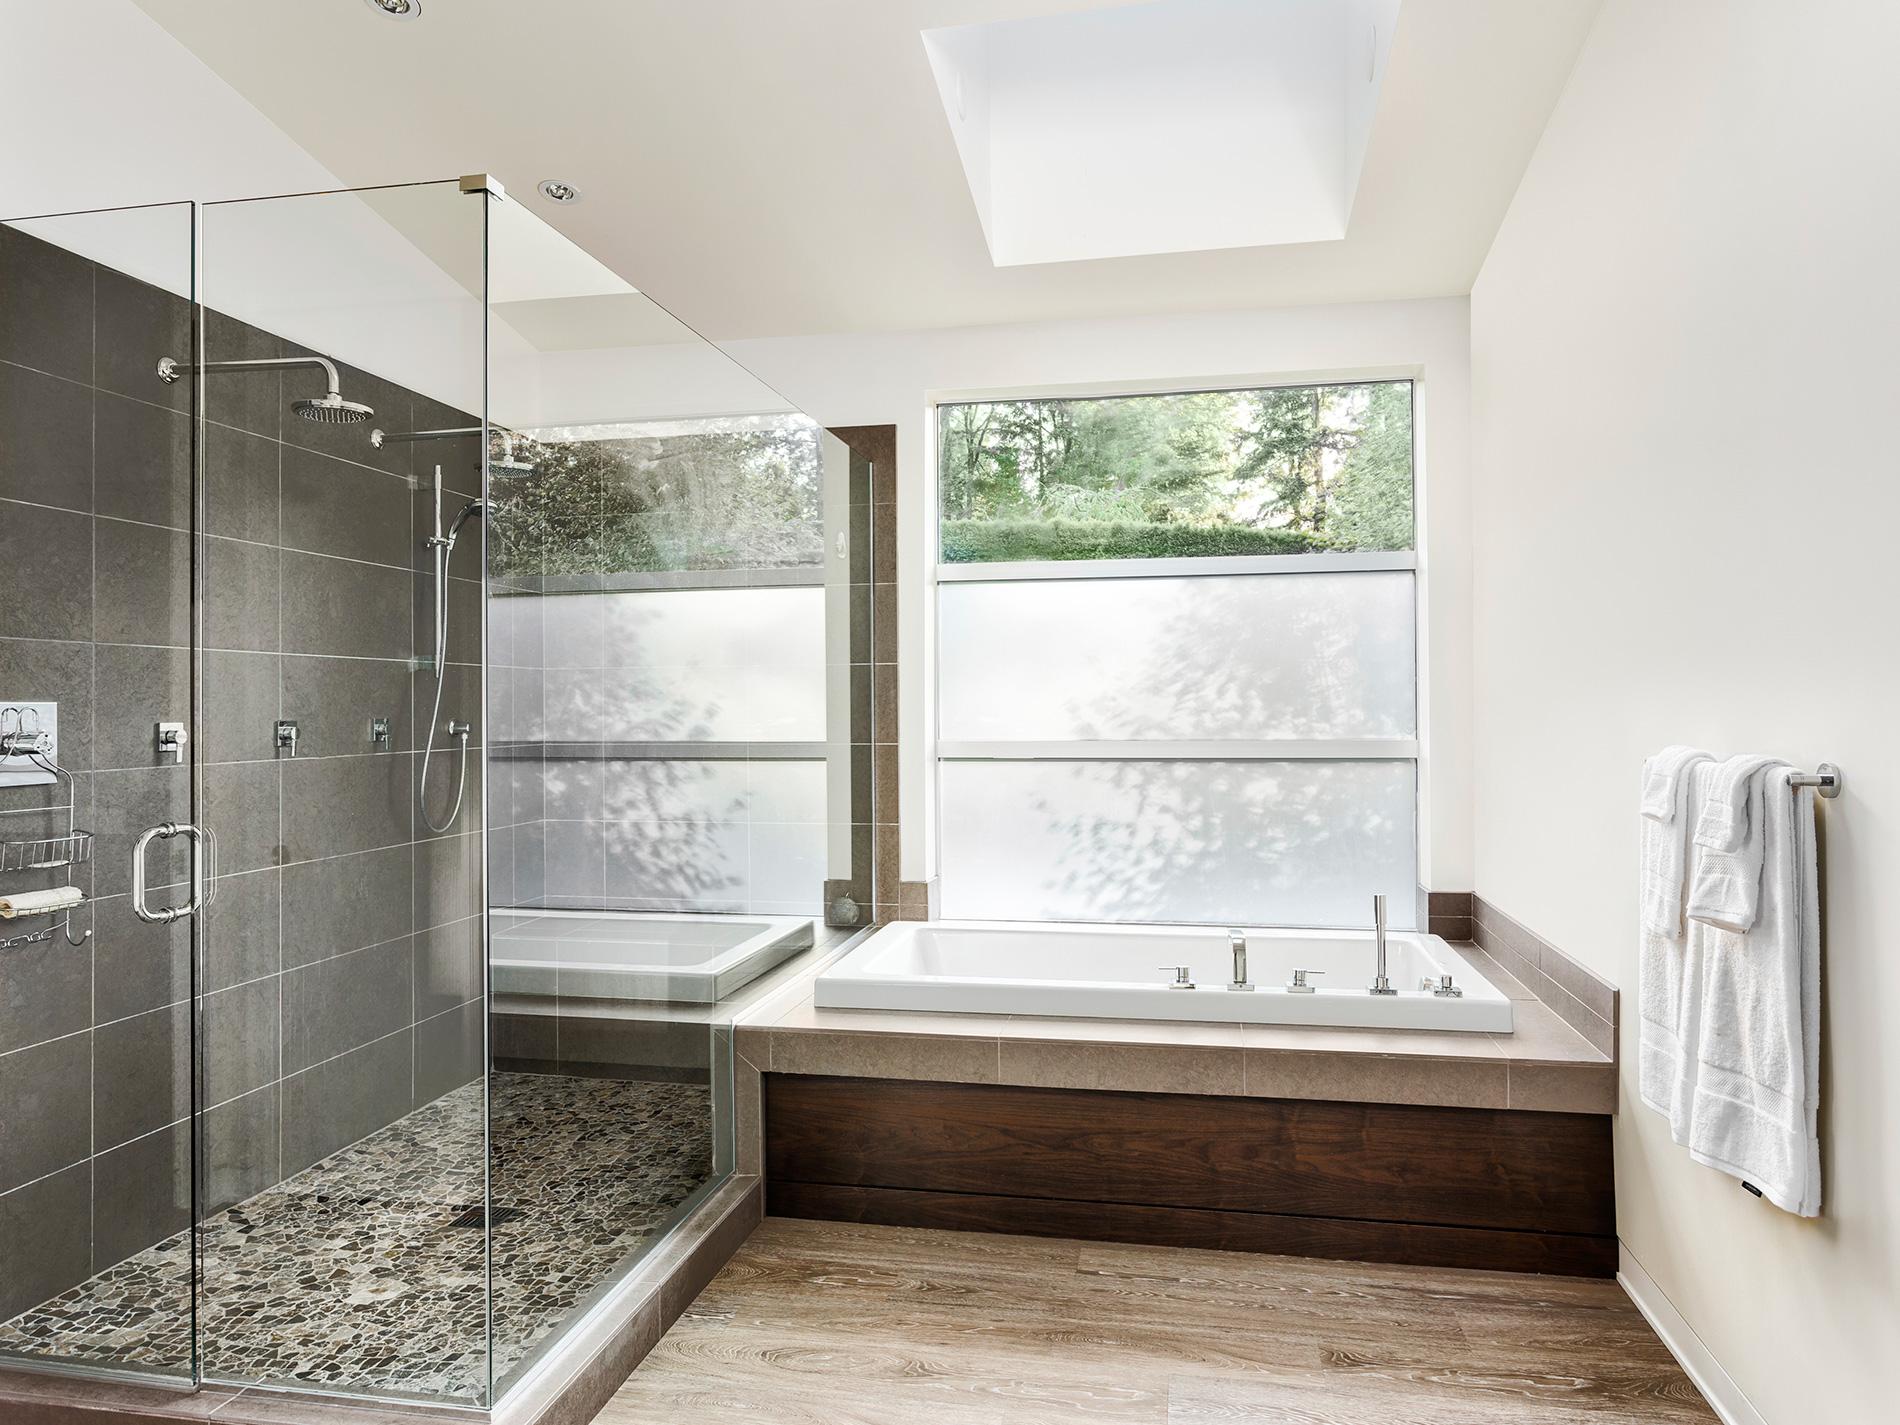 custom-bathroom-hdr - Clear Cut Glass